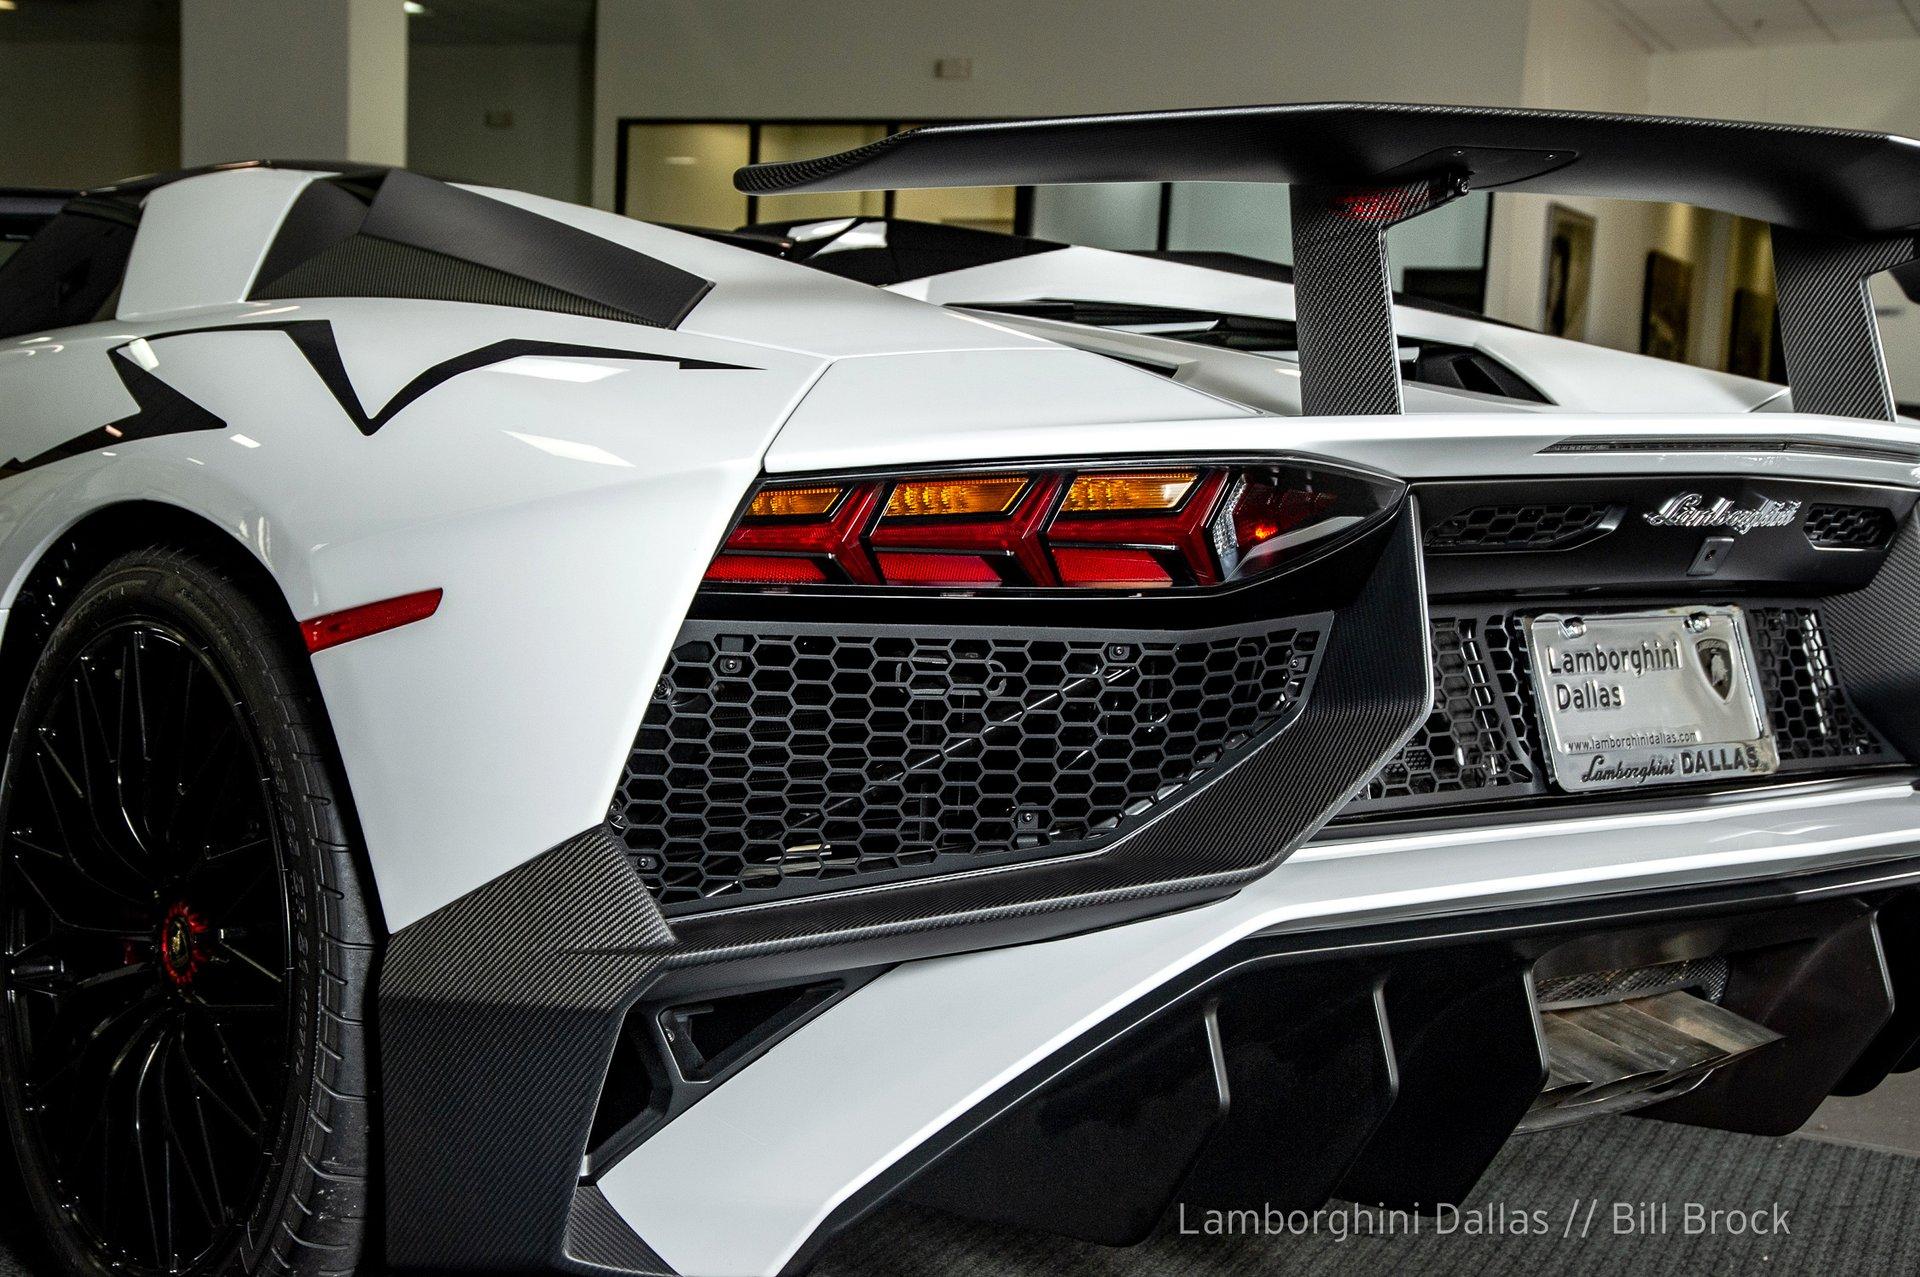 2017 Lamborghini Aventador Sv Roadster For Sale 163542 Motorious